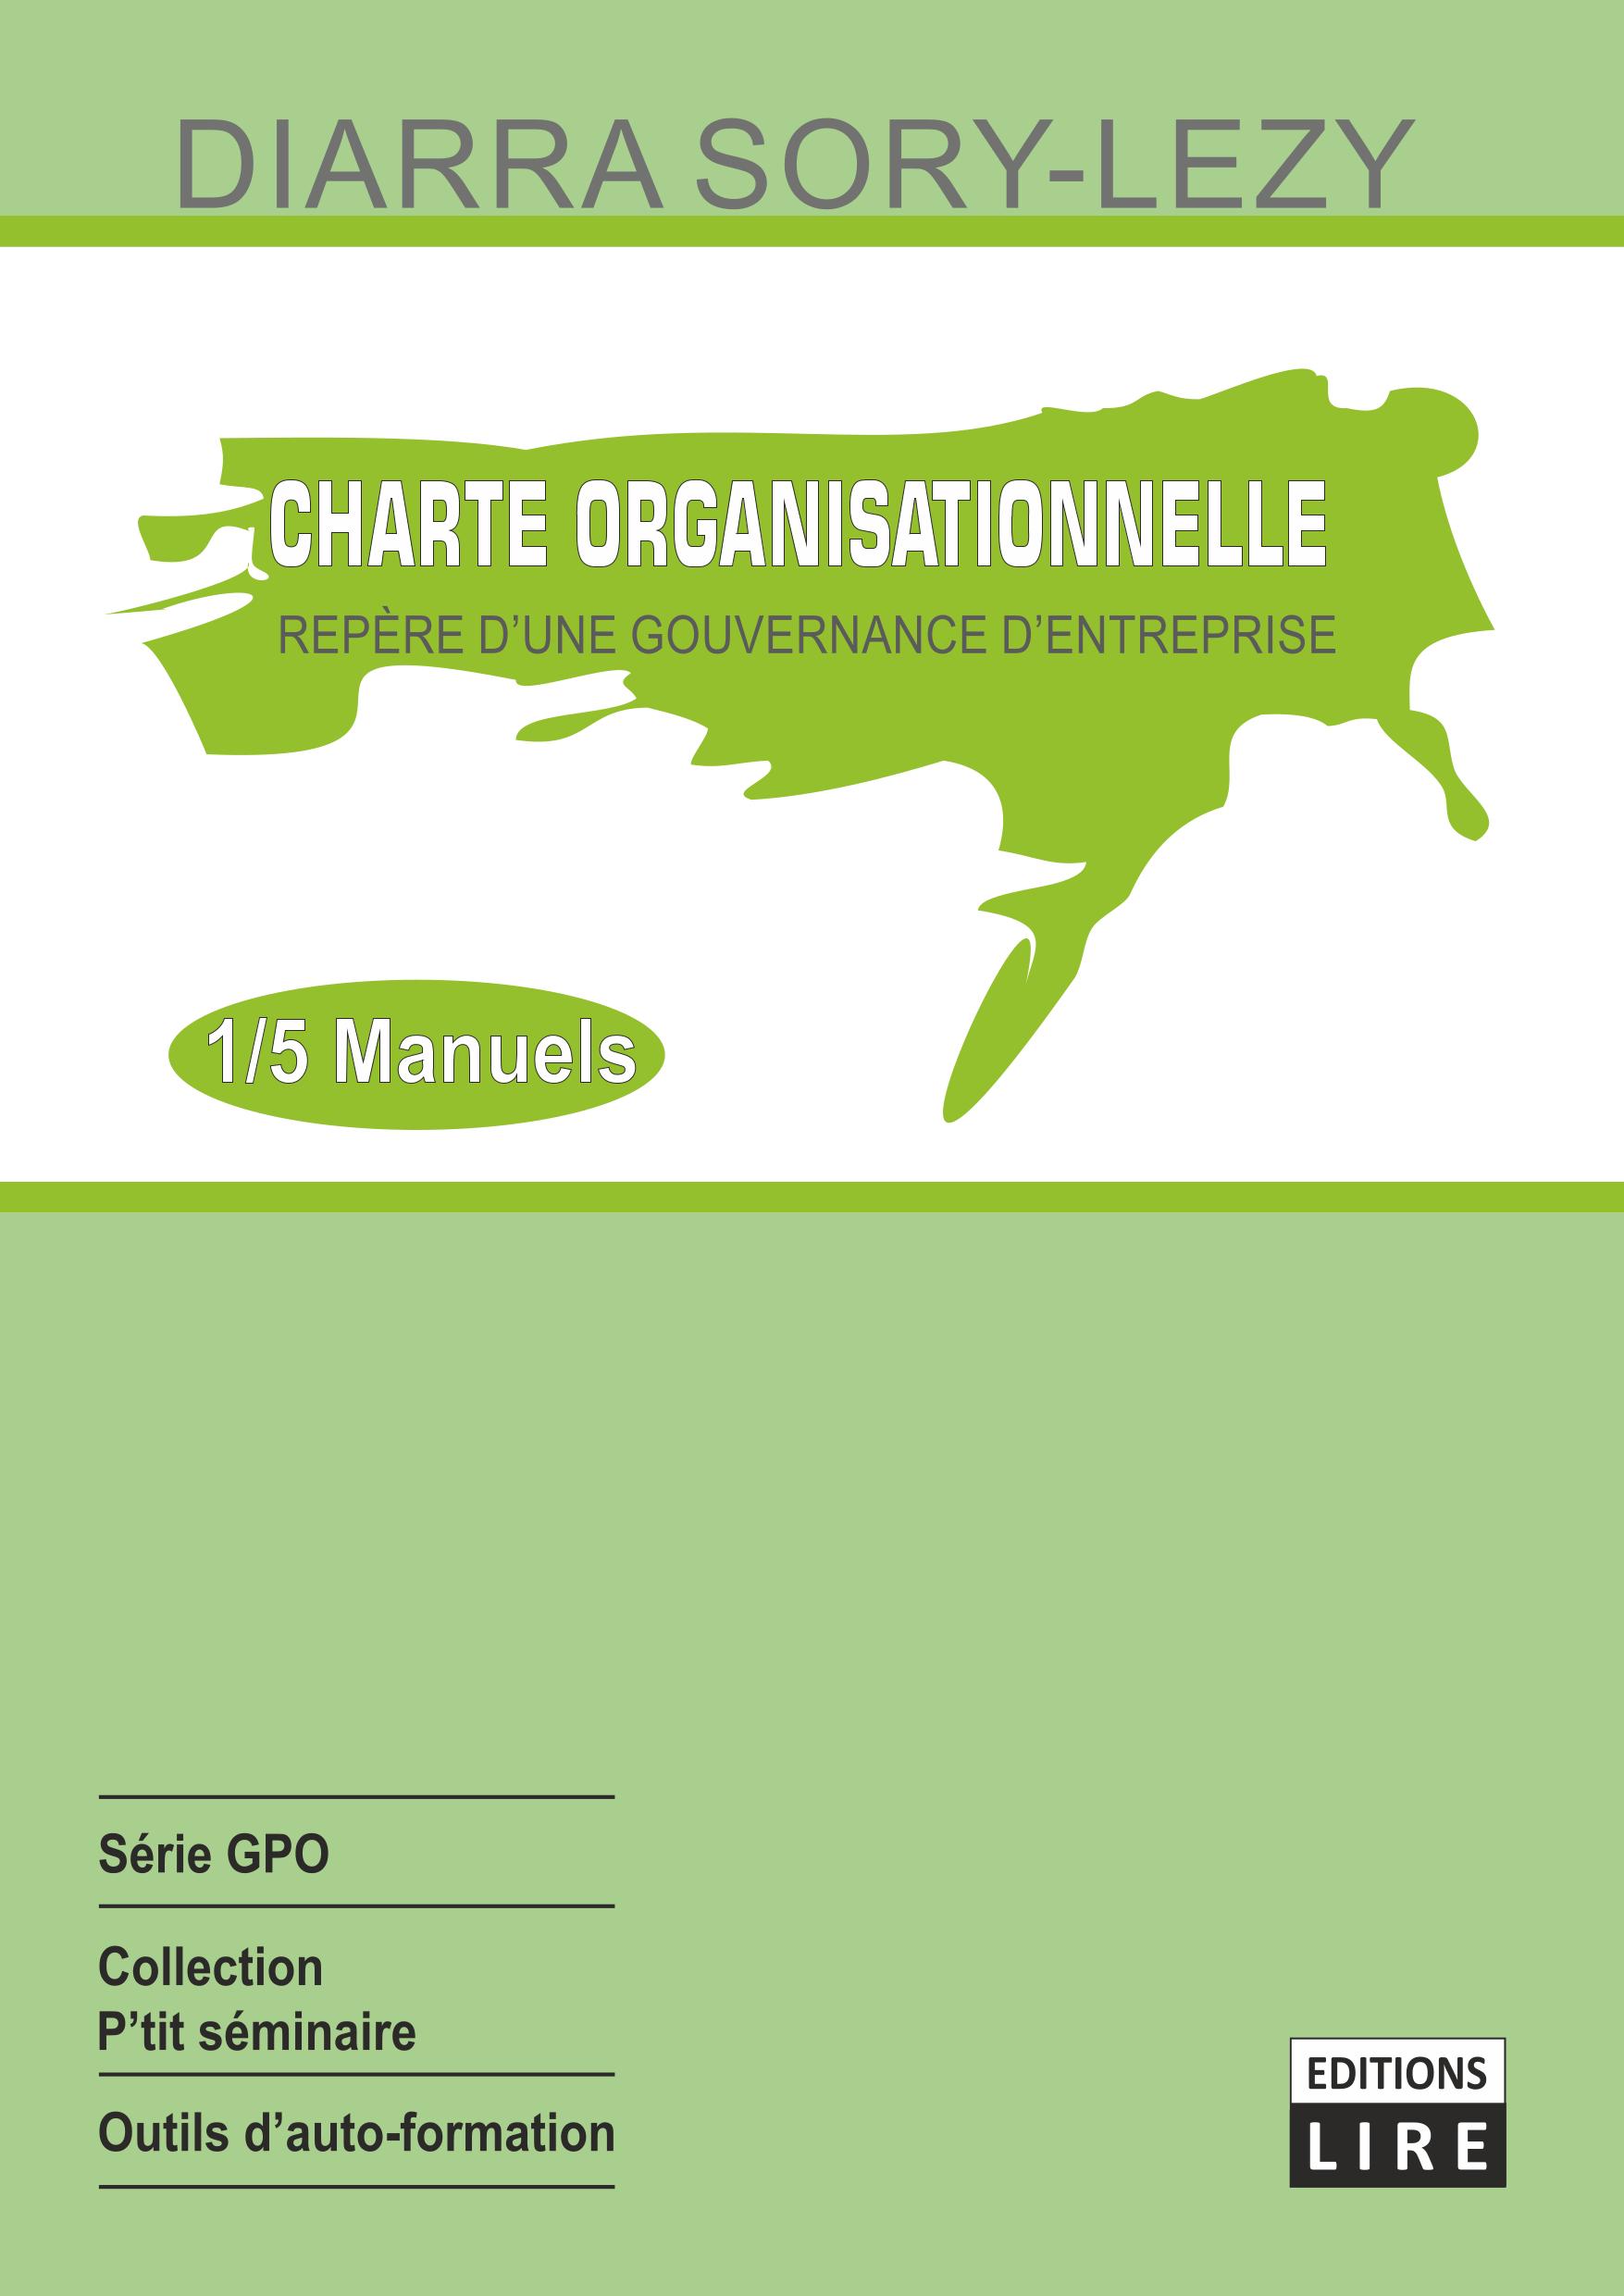 CHARTE ORGANISATIONNELLE